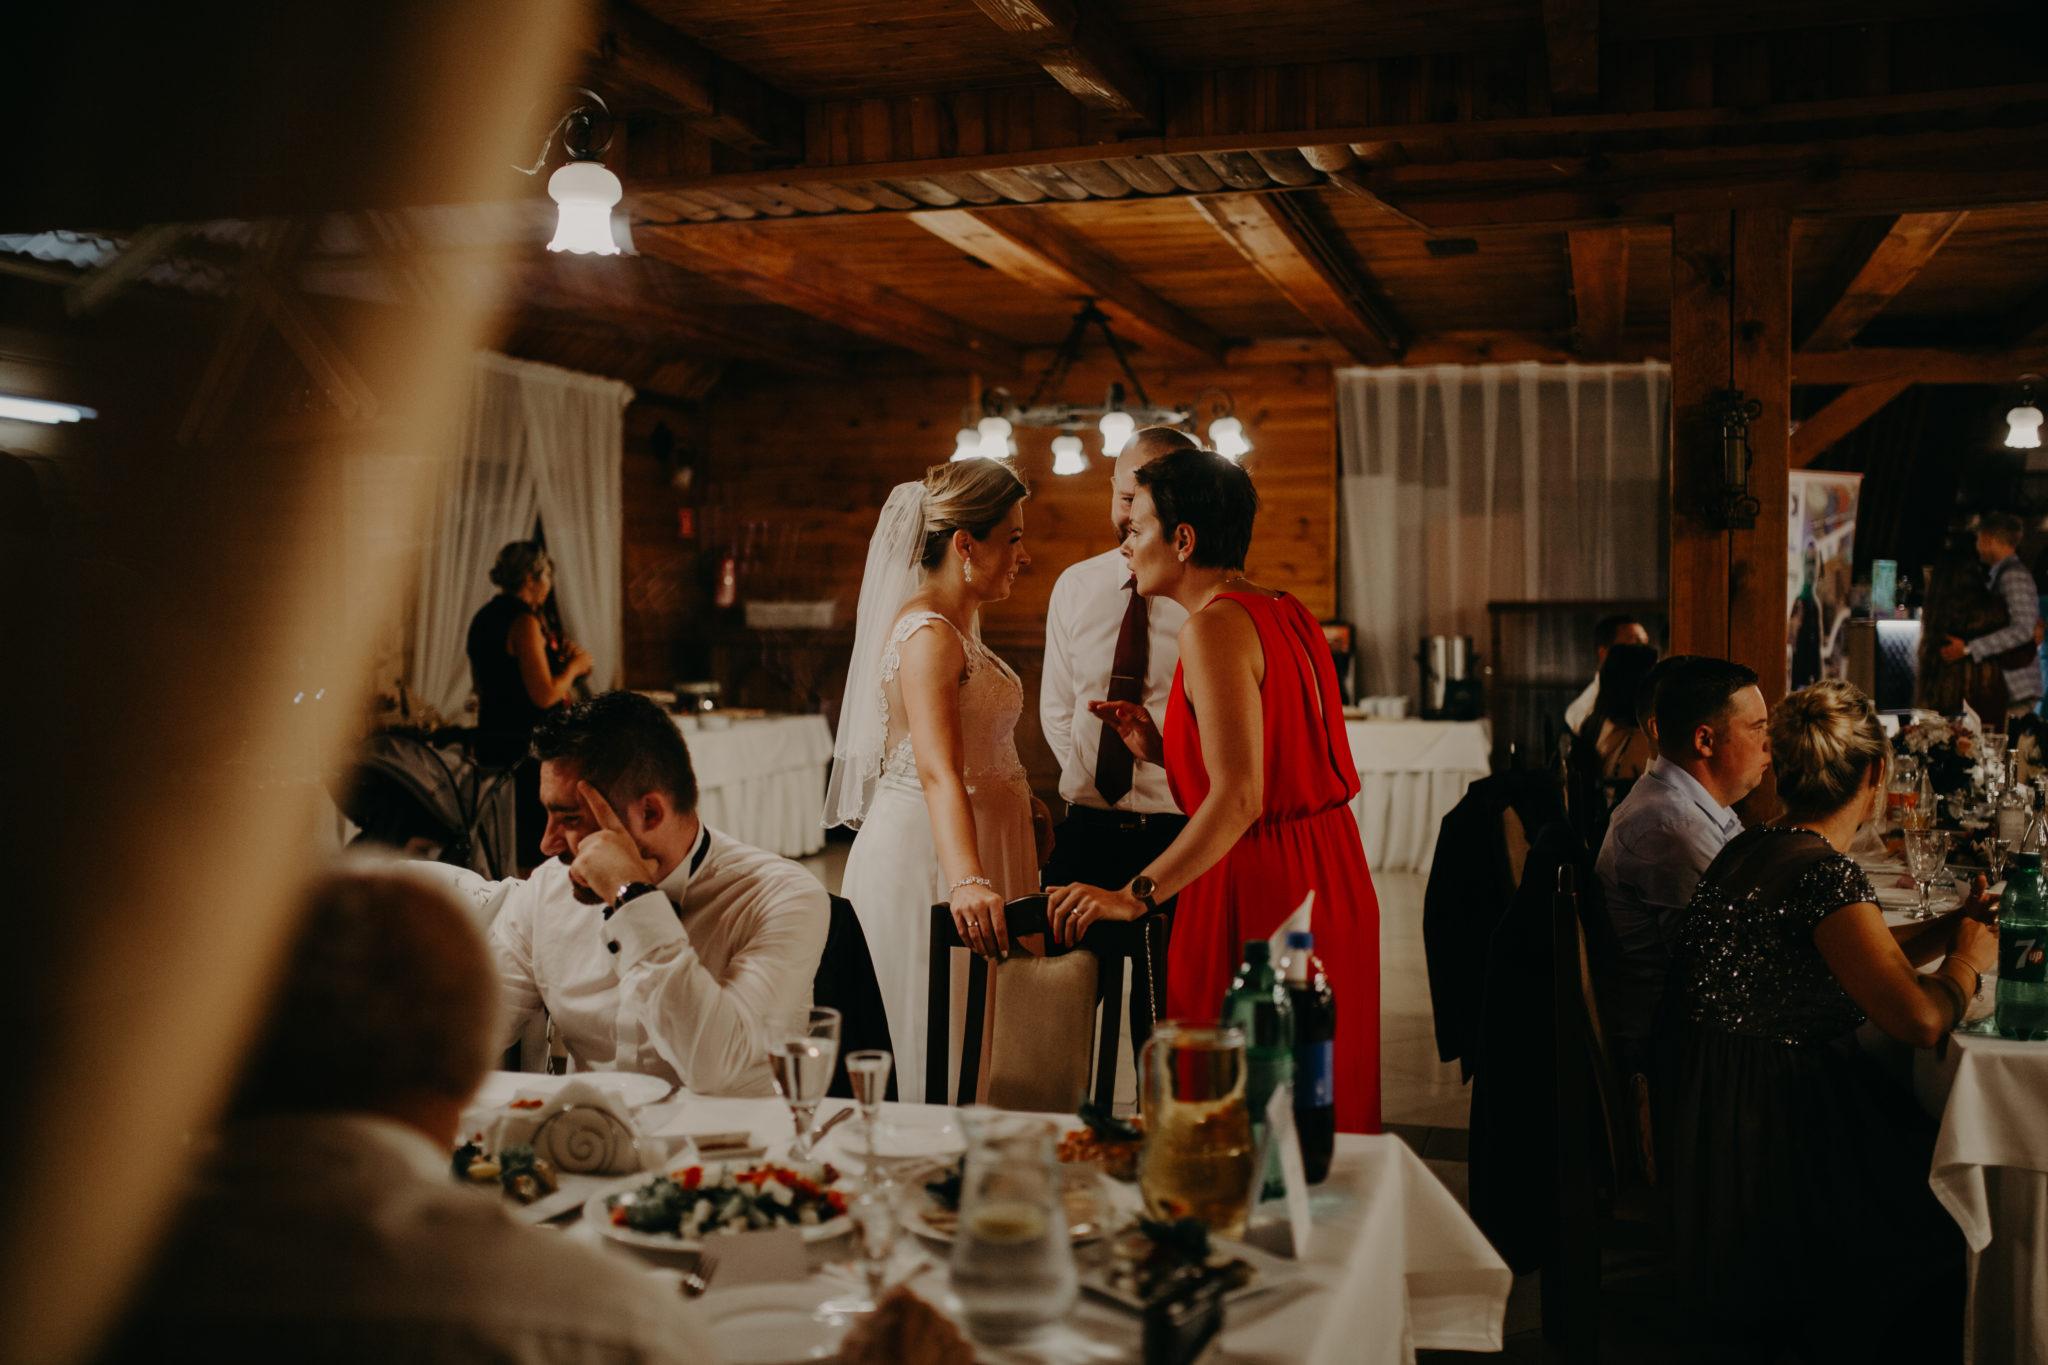 marta i sebastian89 - fotografiams Fotografia ślubna RK wedding